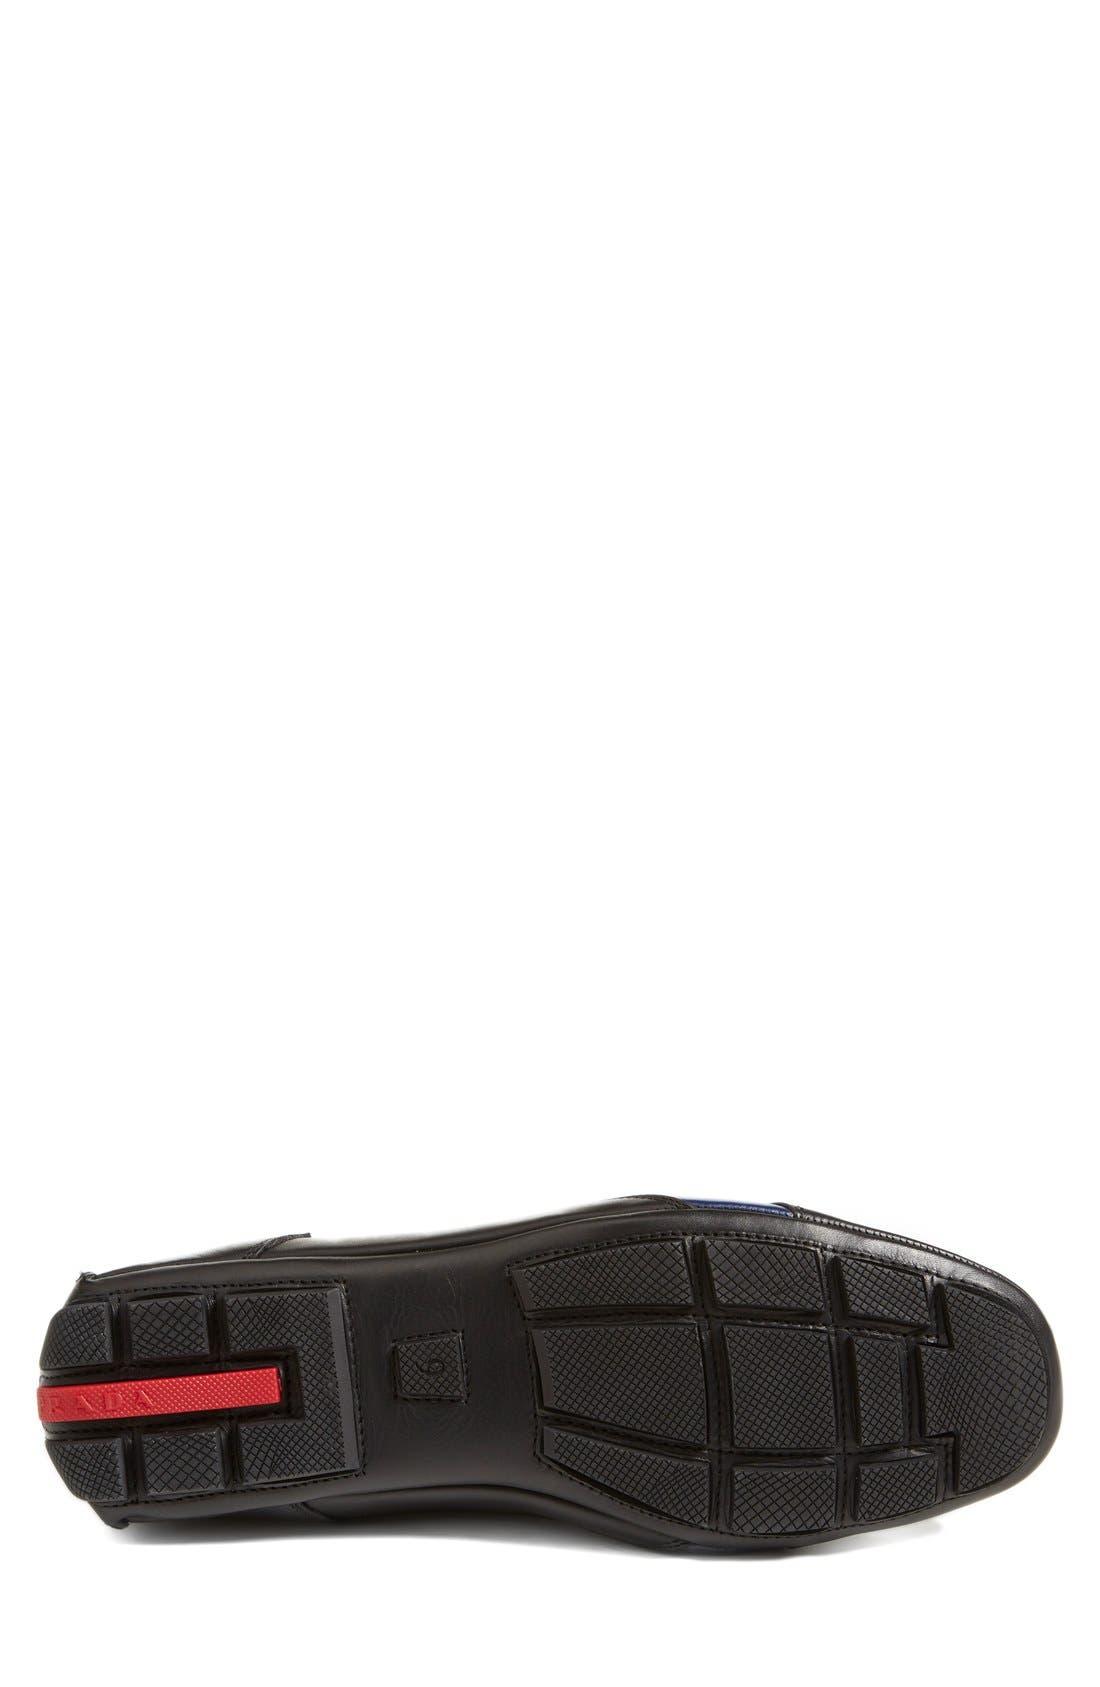 'Monte Carlo' Sneaker,                             Alternate thumbnail 2, color,                             001